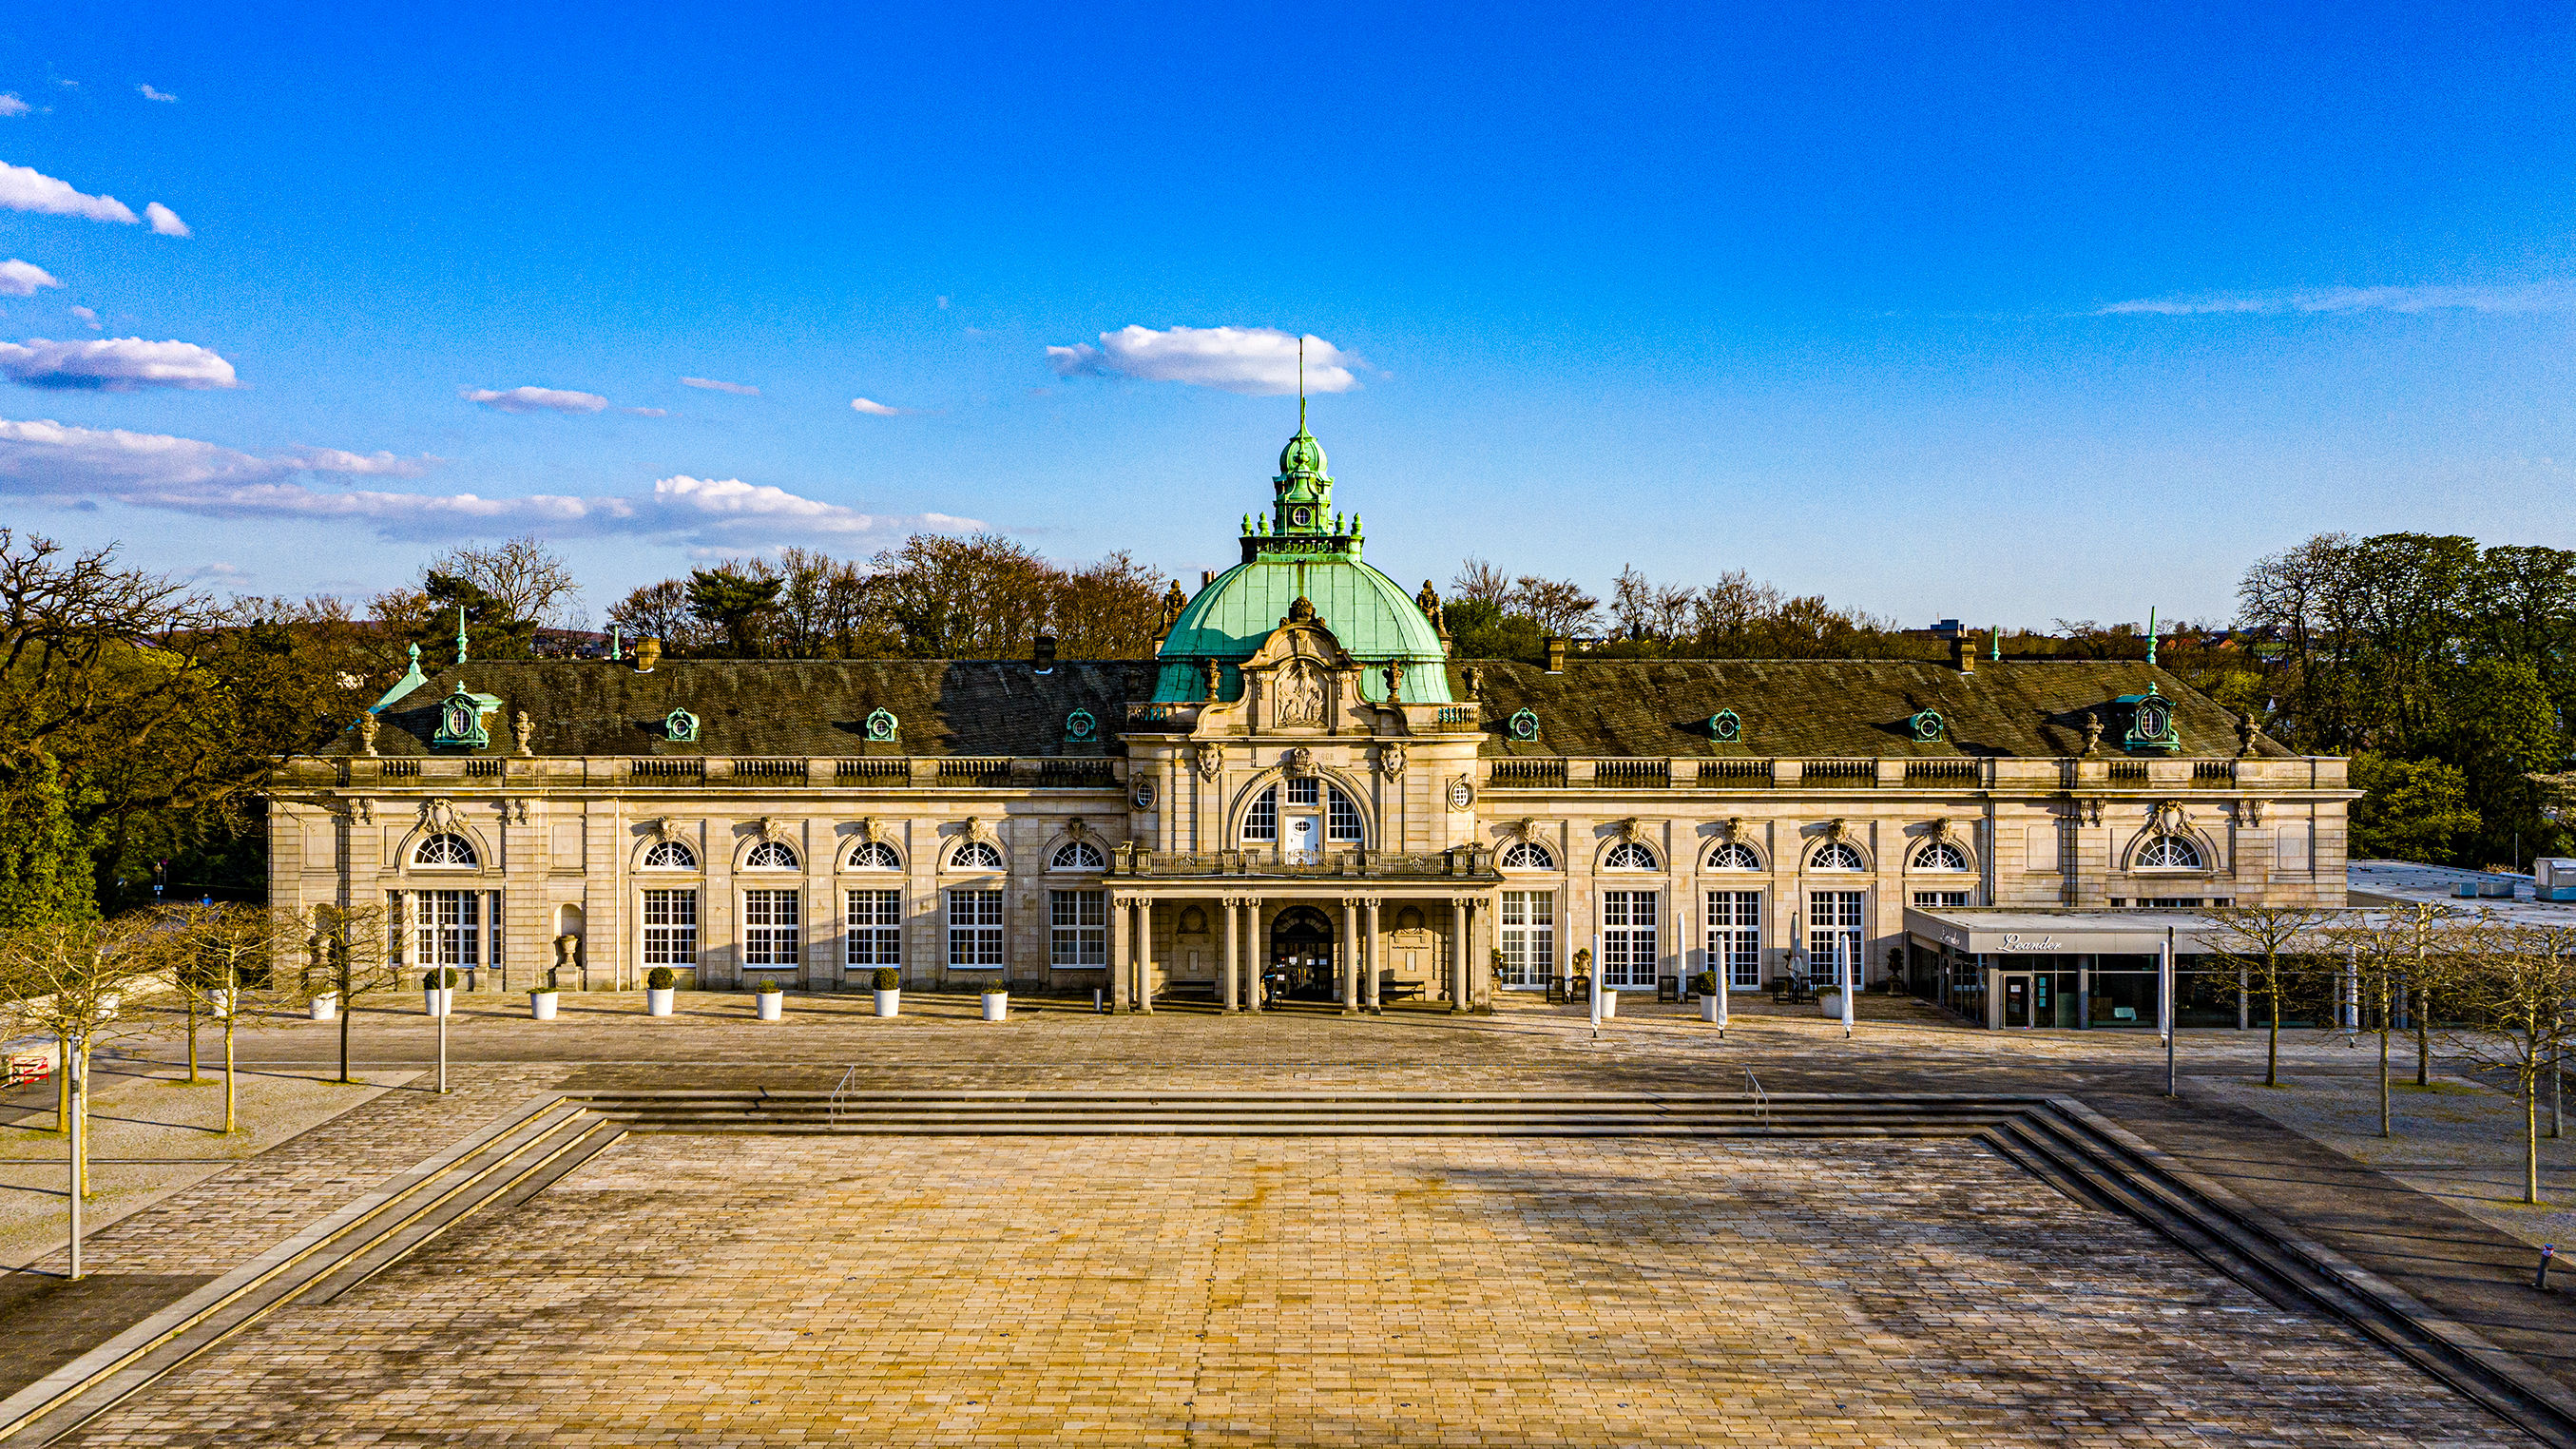 Kaiserpalais, GOP, Adiamo, Kurpark, Bad Oeynhausen, Drohnen Luftaufnahmen, Dj Team Herford, Fotobox Herford, Sebastian Bader